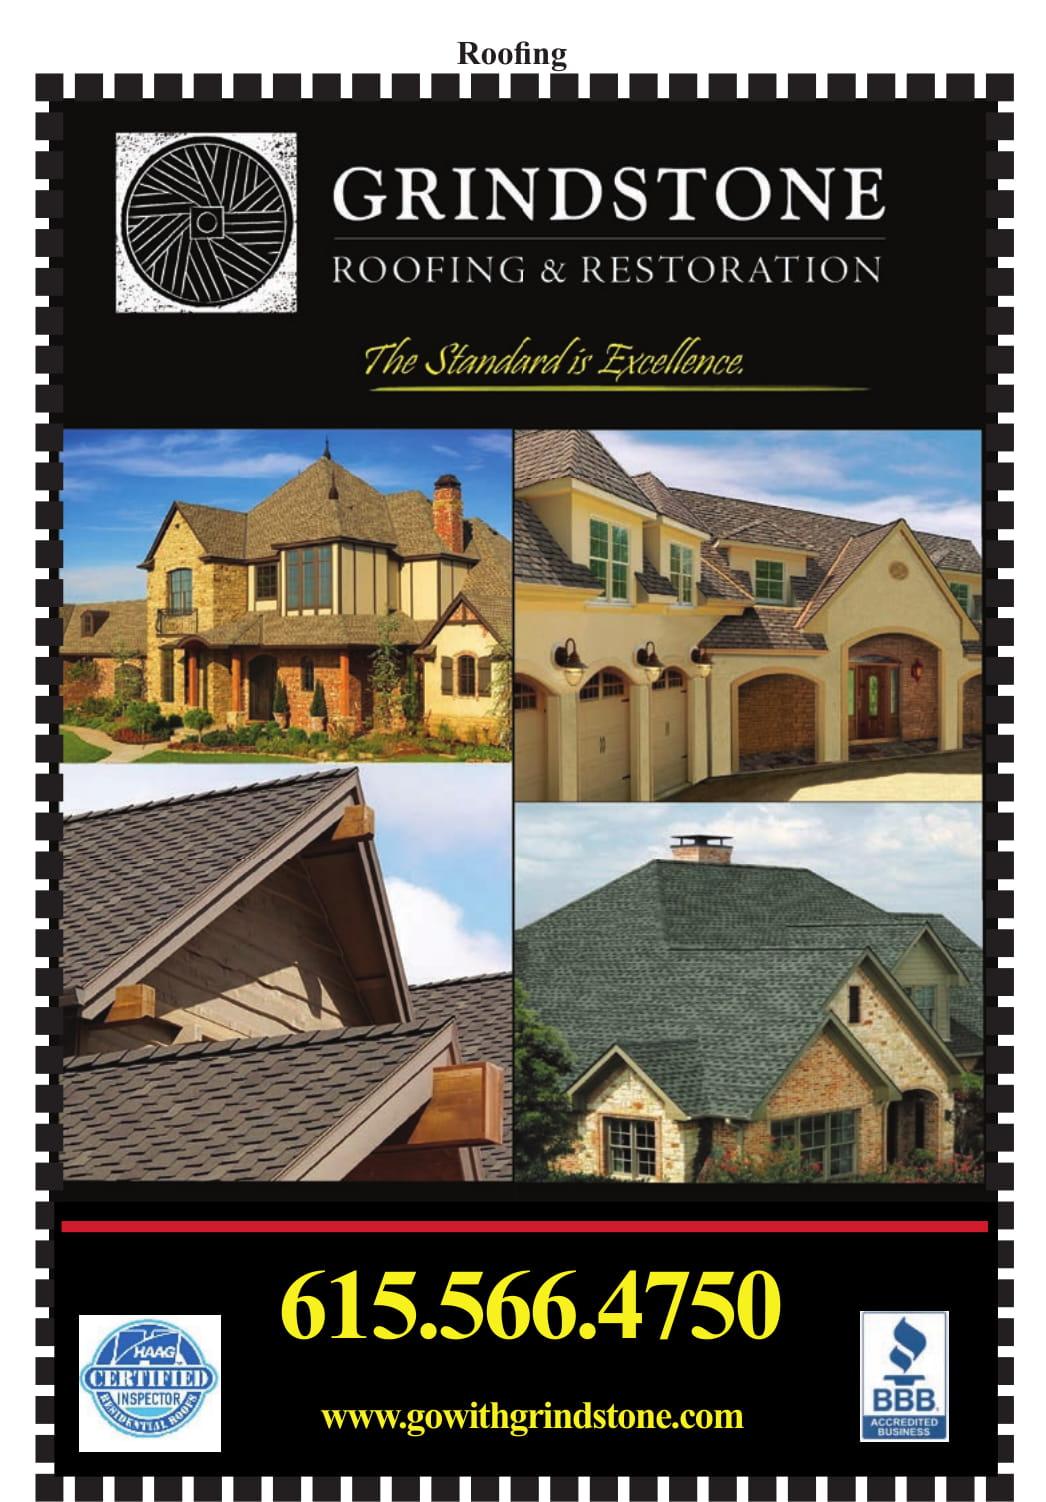 Grindstone Roofing and Restoration